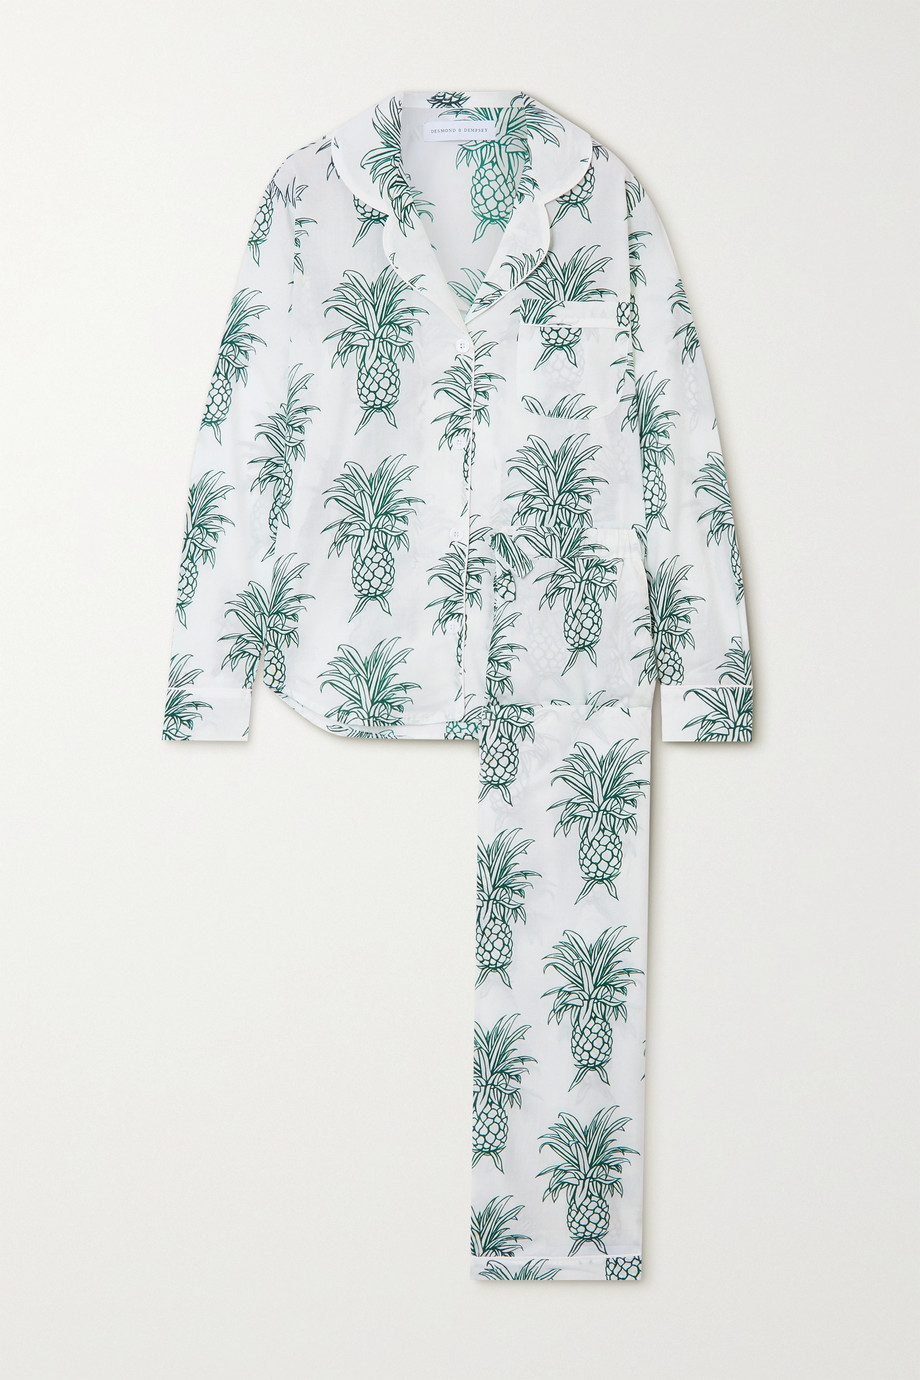 Desmond & Dempsey Howie printed organic cotton pajama set